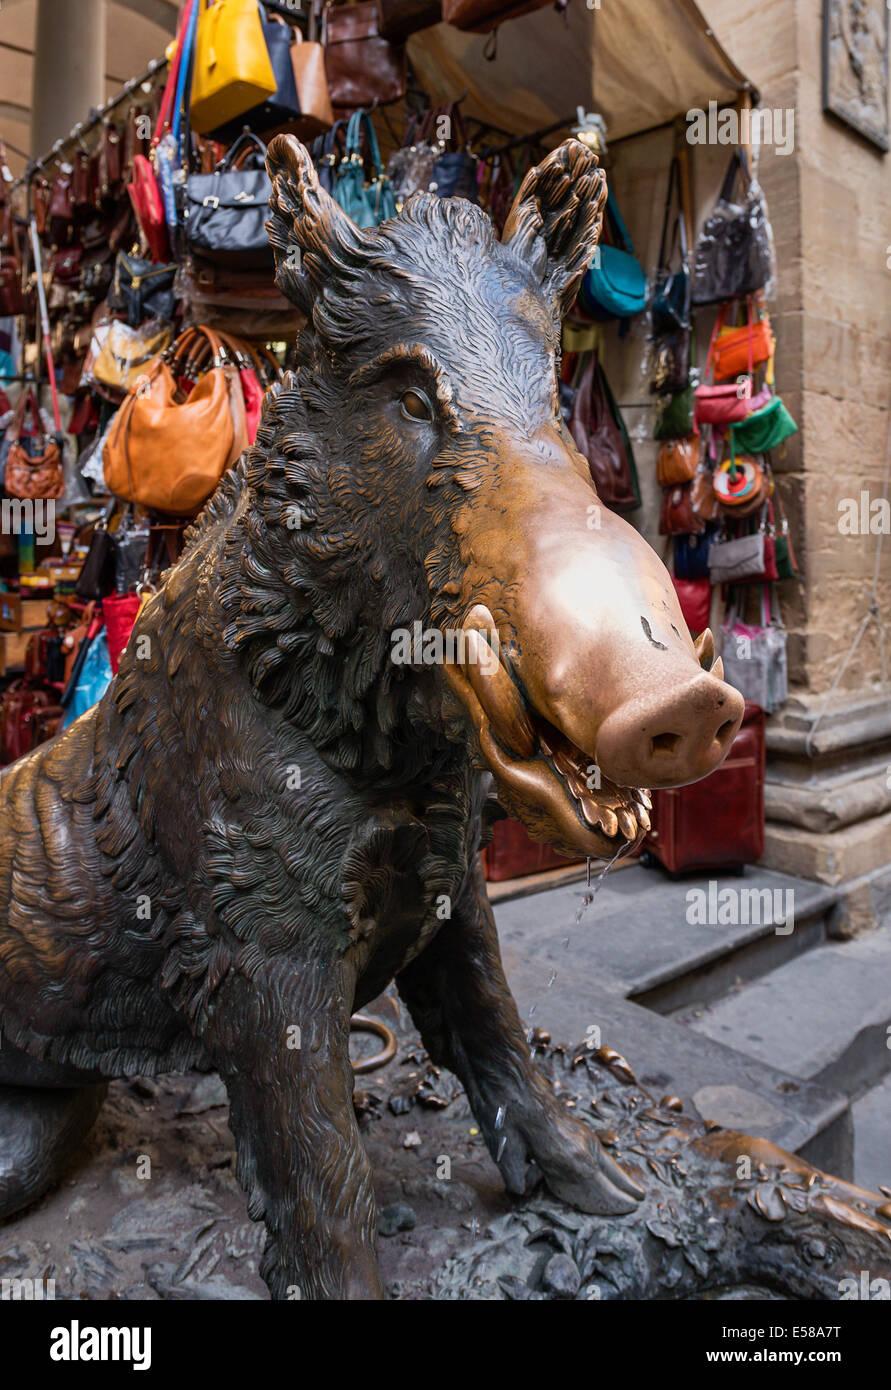 Il Porcellino sculpture at Mercato Nuovo, Florence, Italy Stock Photo